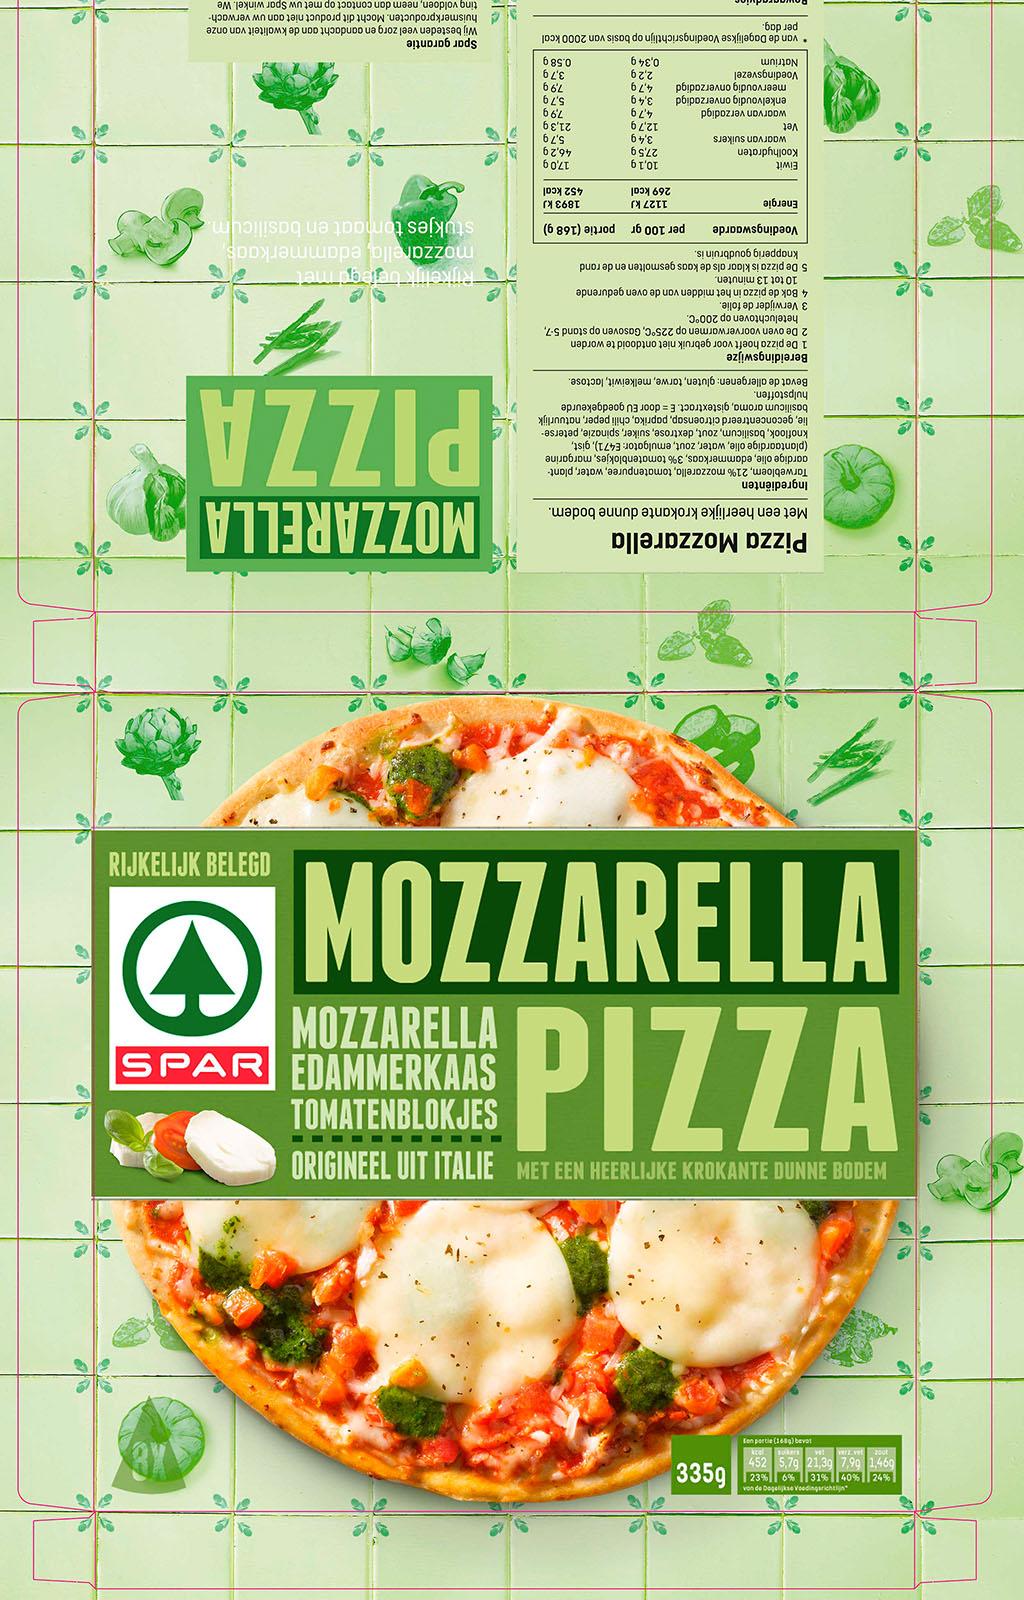 https://crisp.cc/wp-content/uploads/2018/11/Spar-Mozzarella-Pizza.jpg